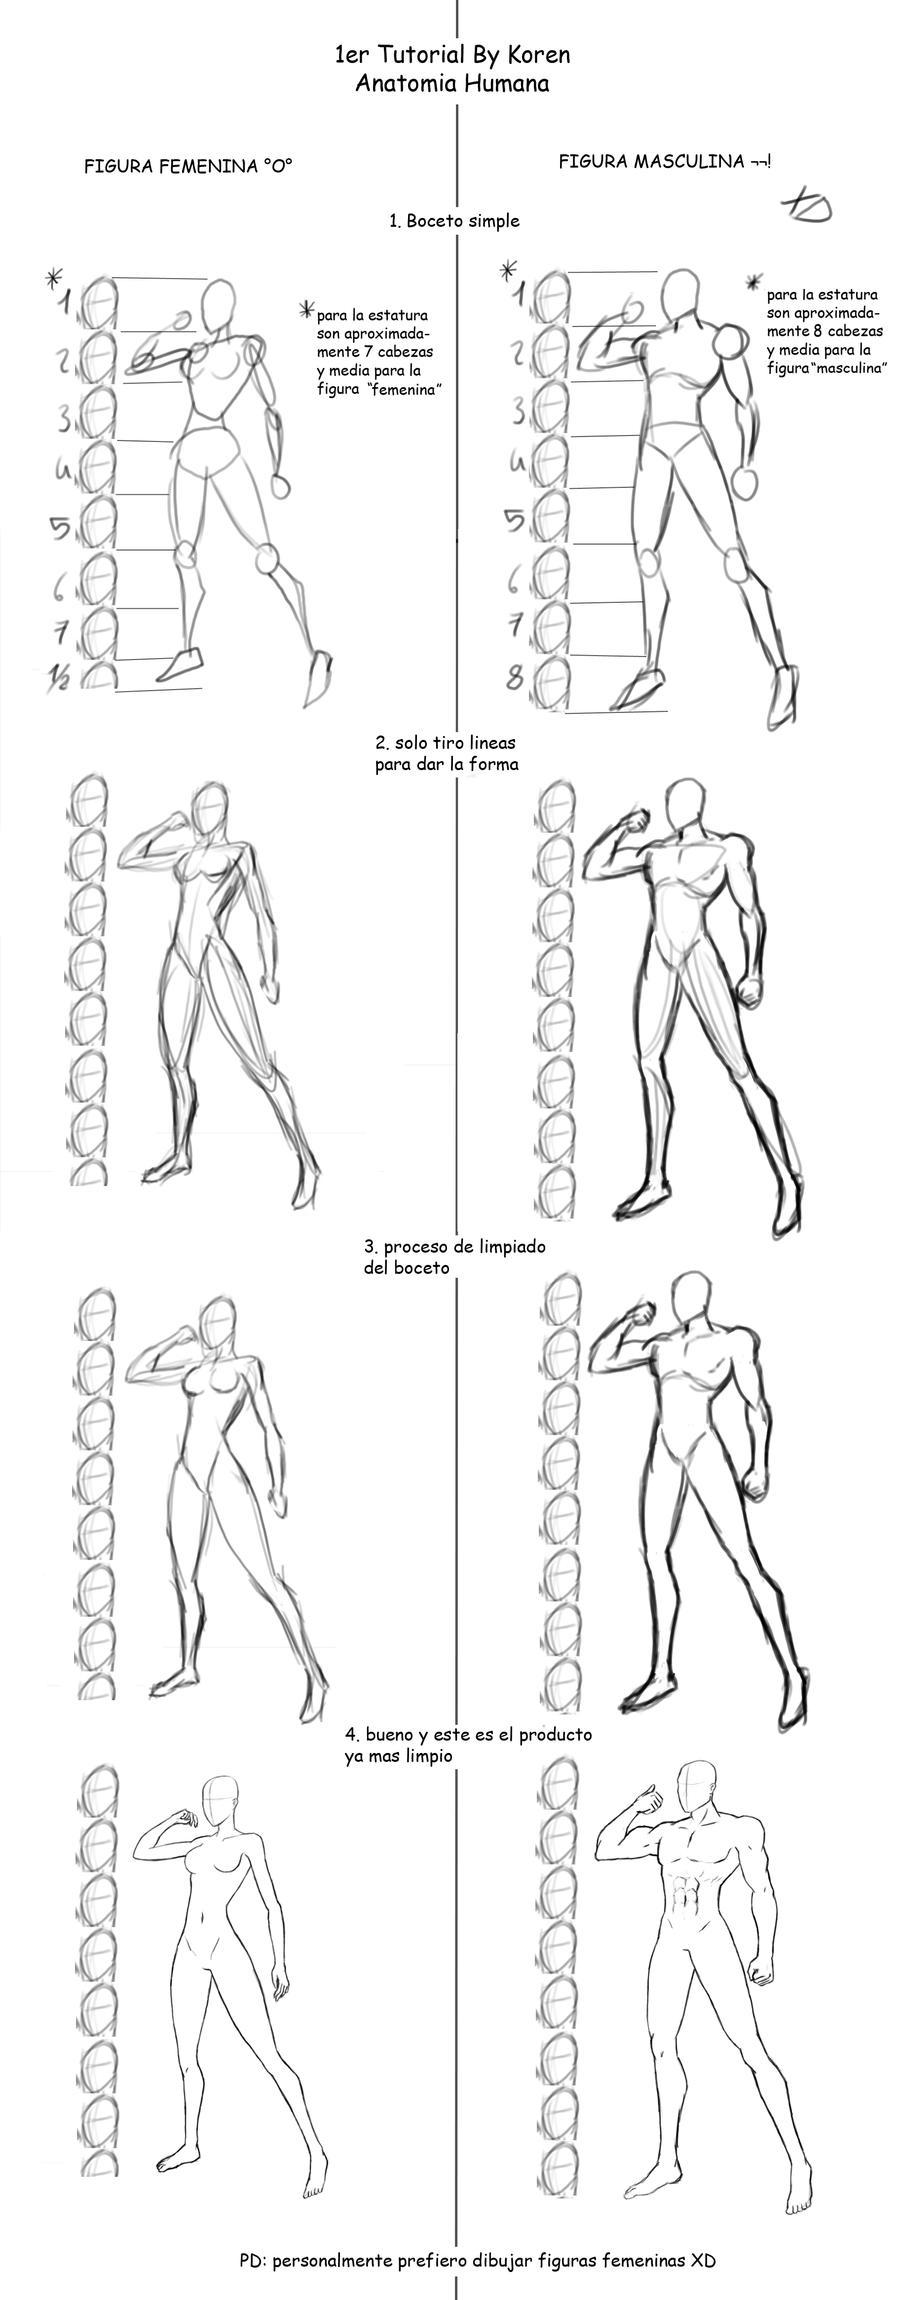 Tutorial Anatomia Humana by Koren-Leo on DeviantArt